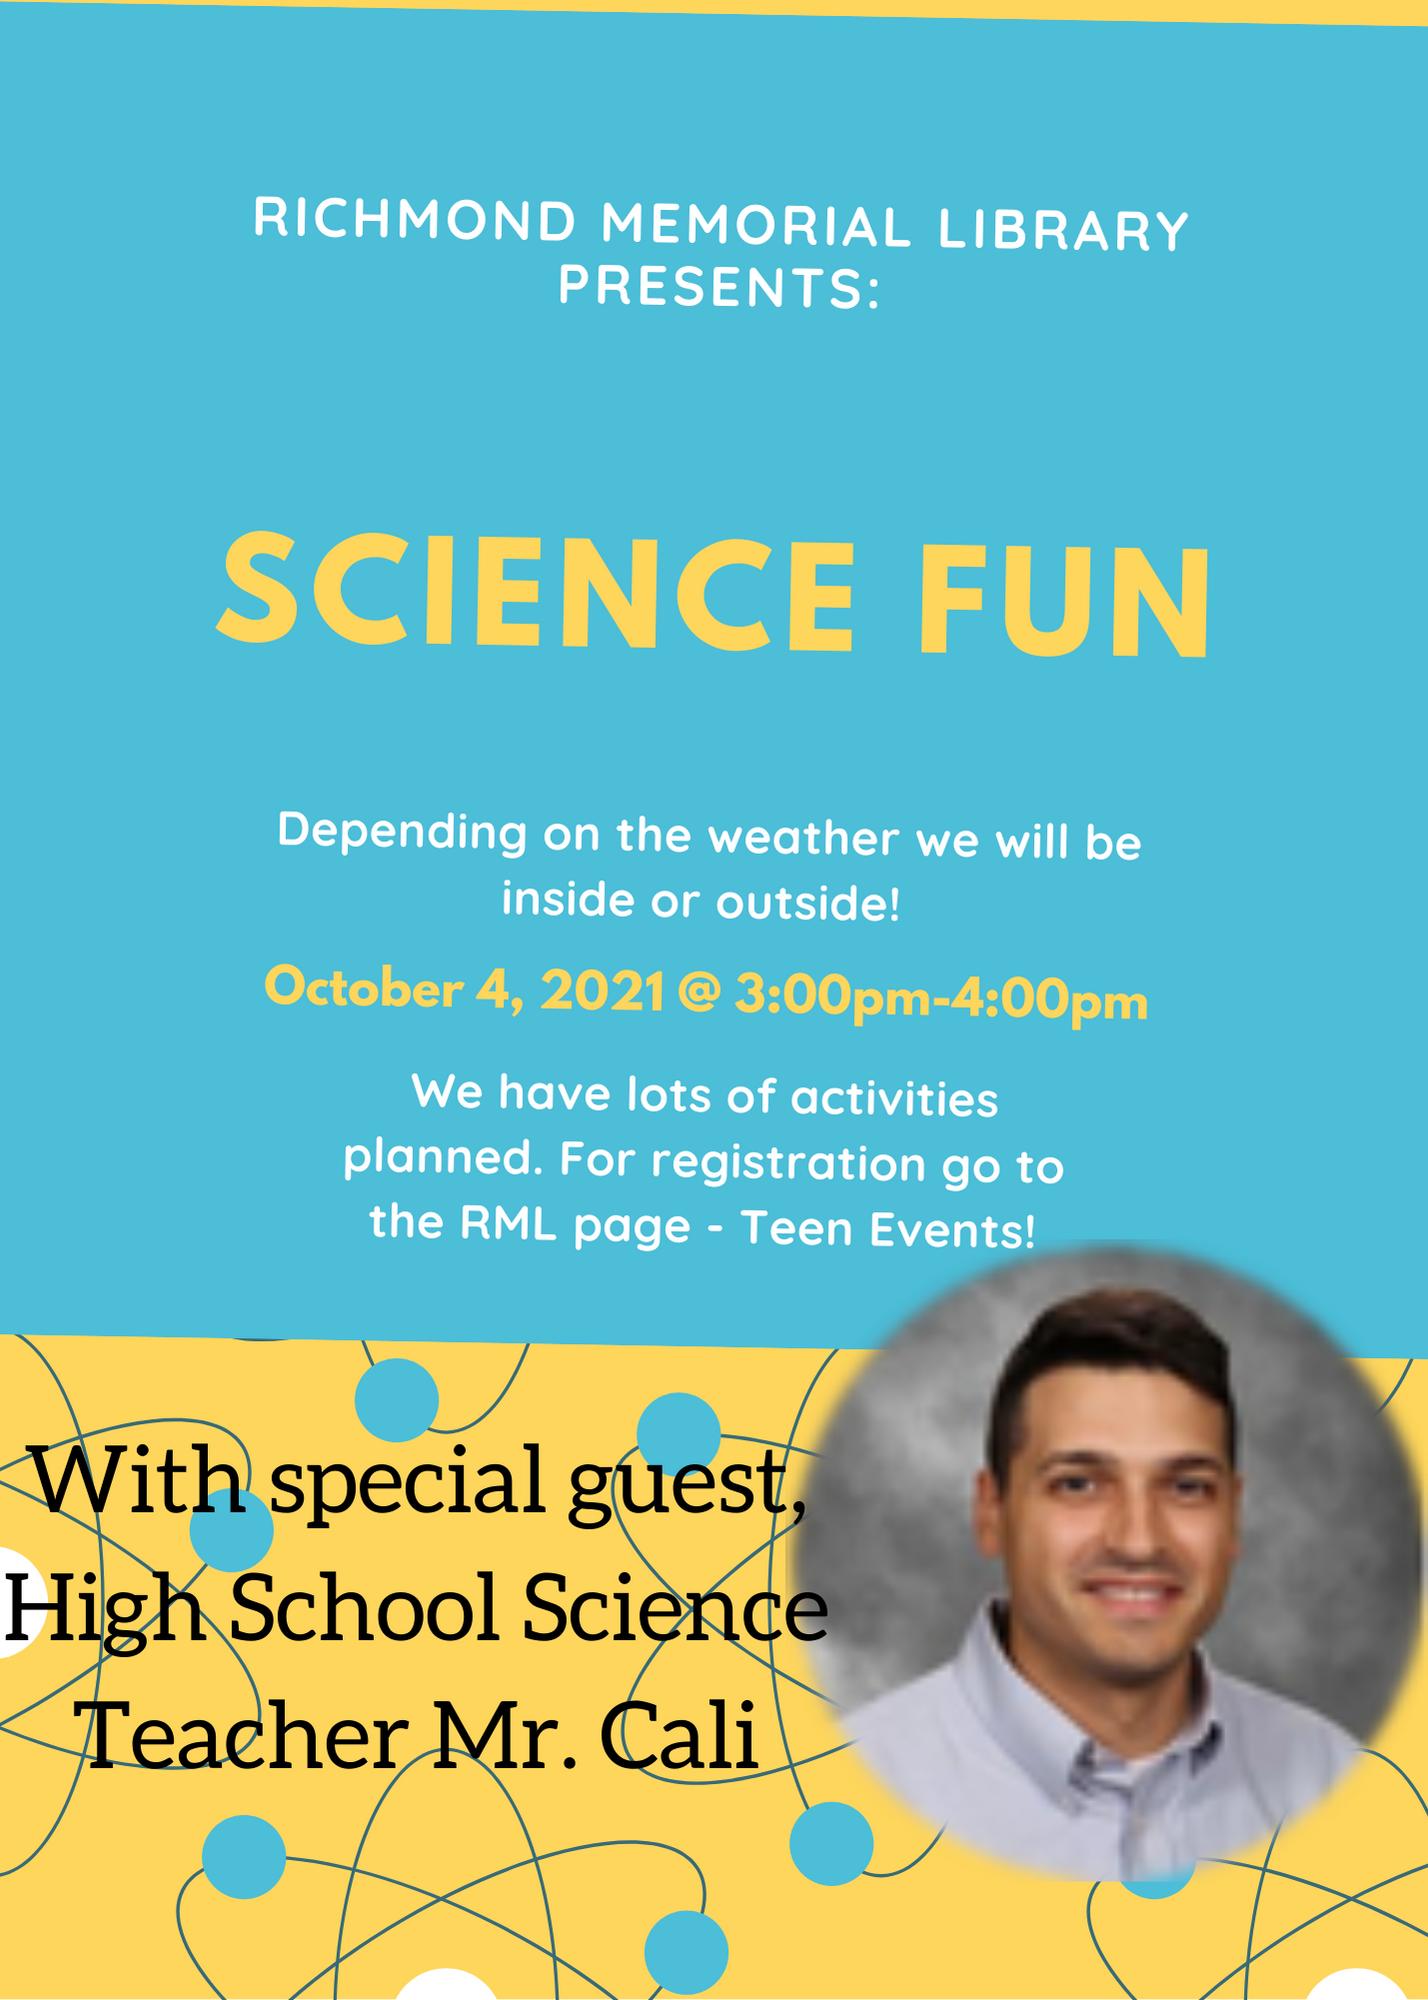 Science Fun with Mr. Cali